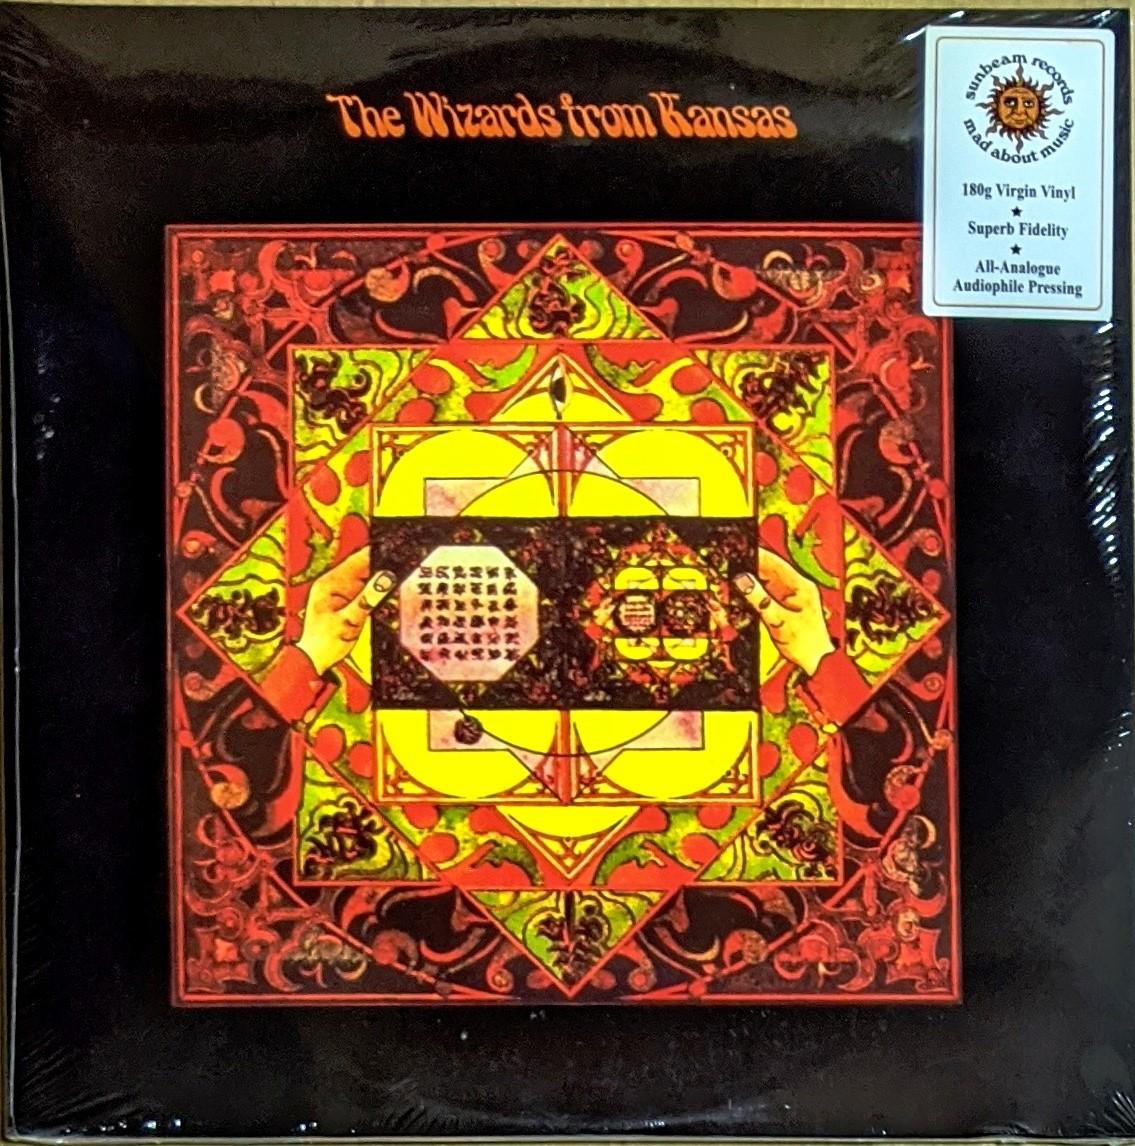 The Wizards From Kansas 限定二枚組アナログ・レコード